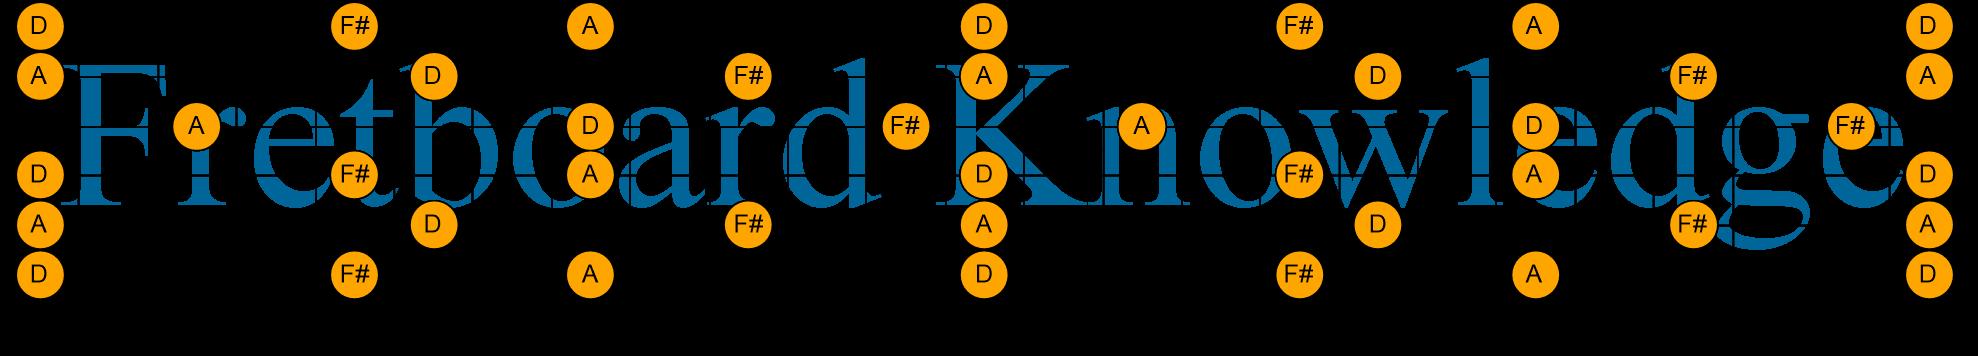 D Major Triad Dadgad Chord Voicings Guitar Fretboard Knowledge